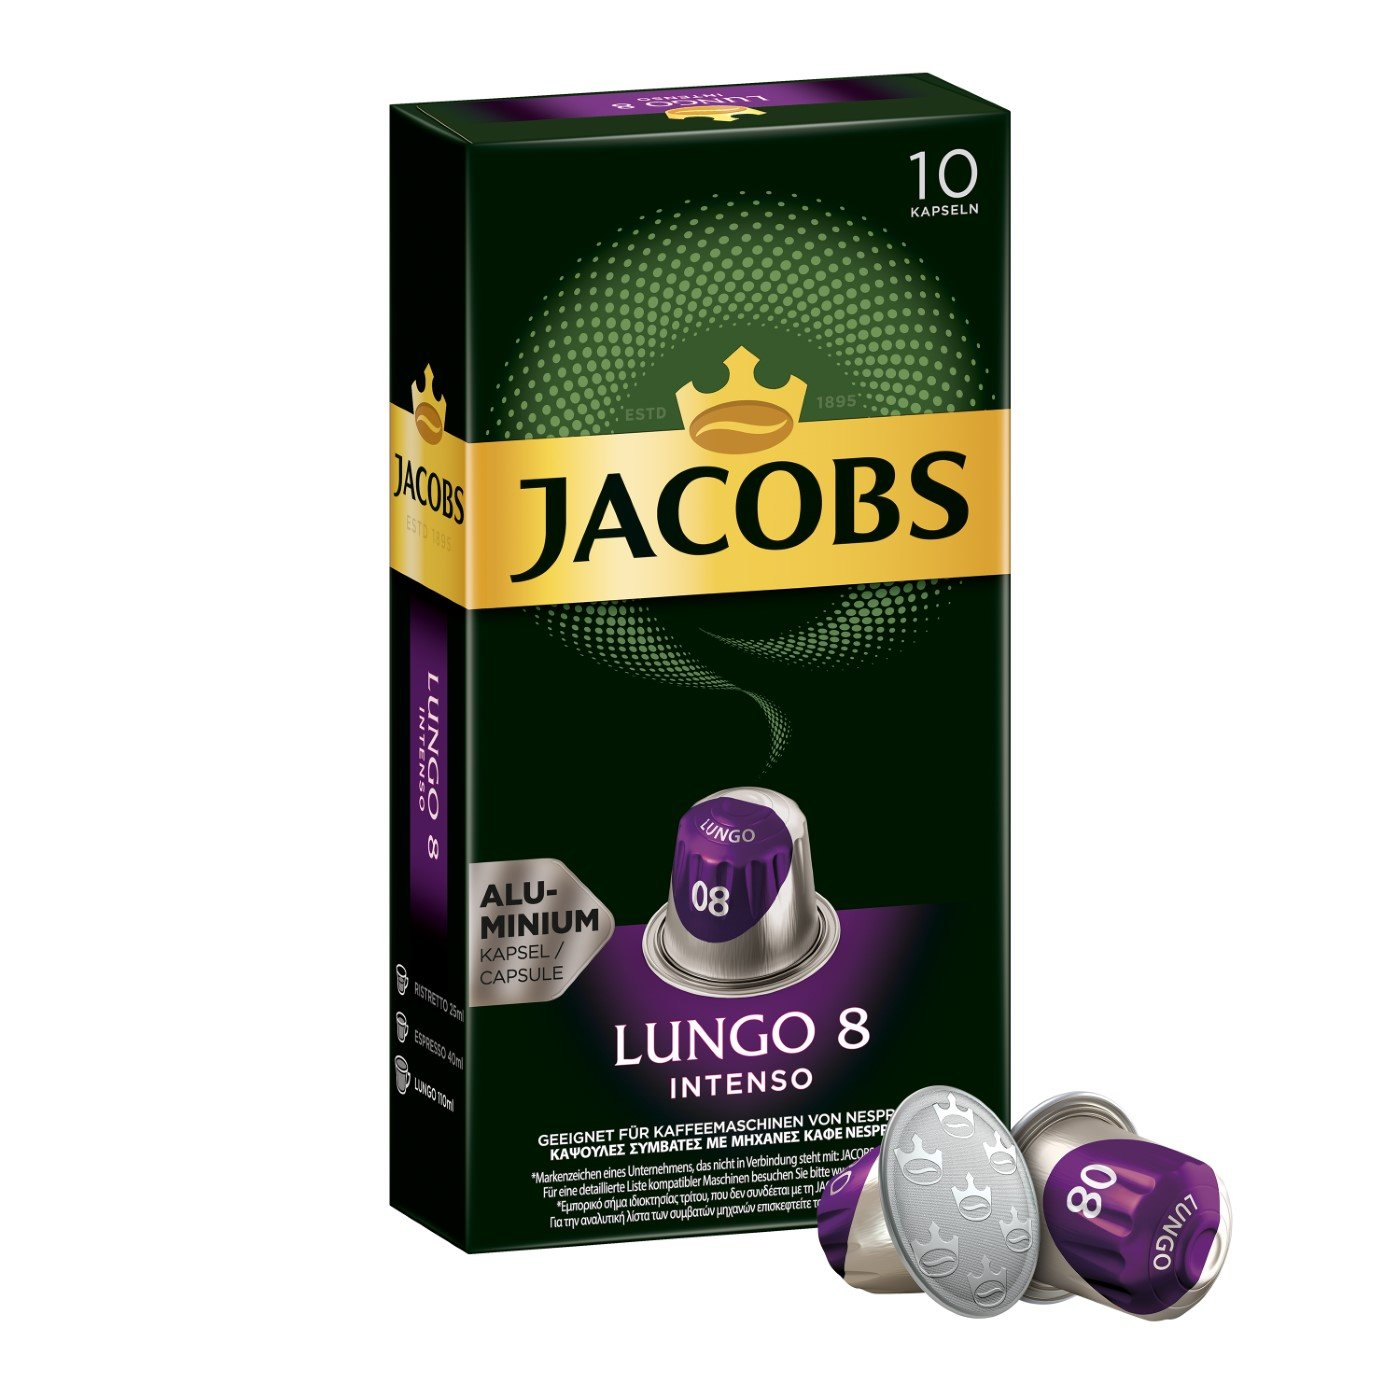 Jacobs Lungo 8 Intenso 咖啡胶囊5包x10只